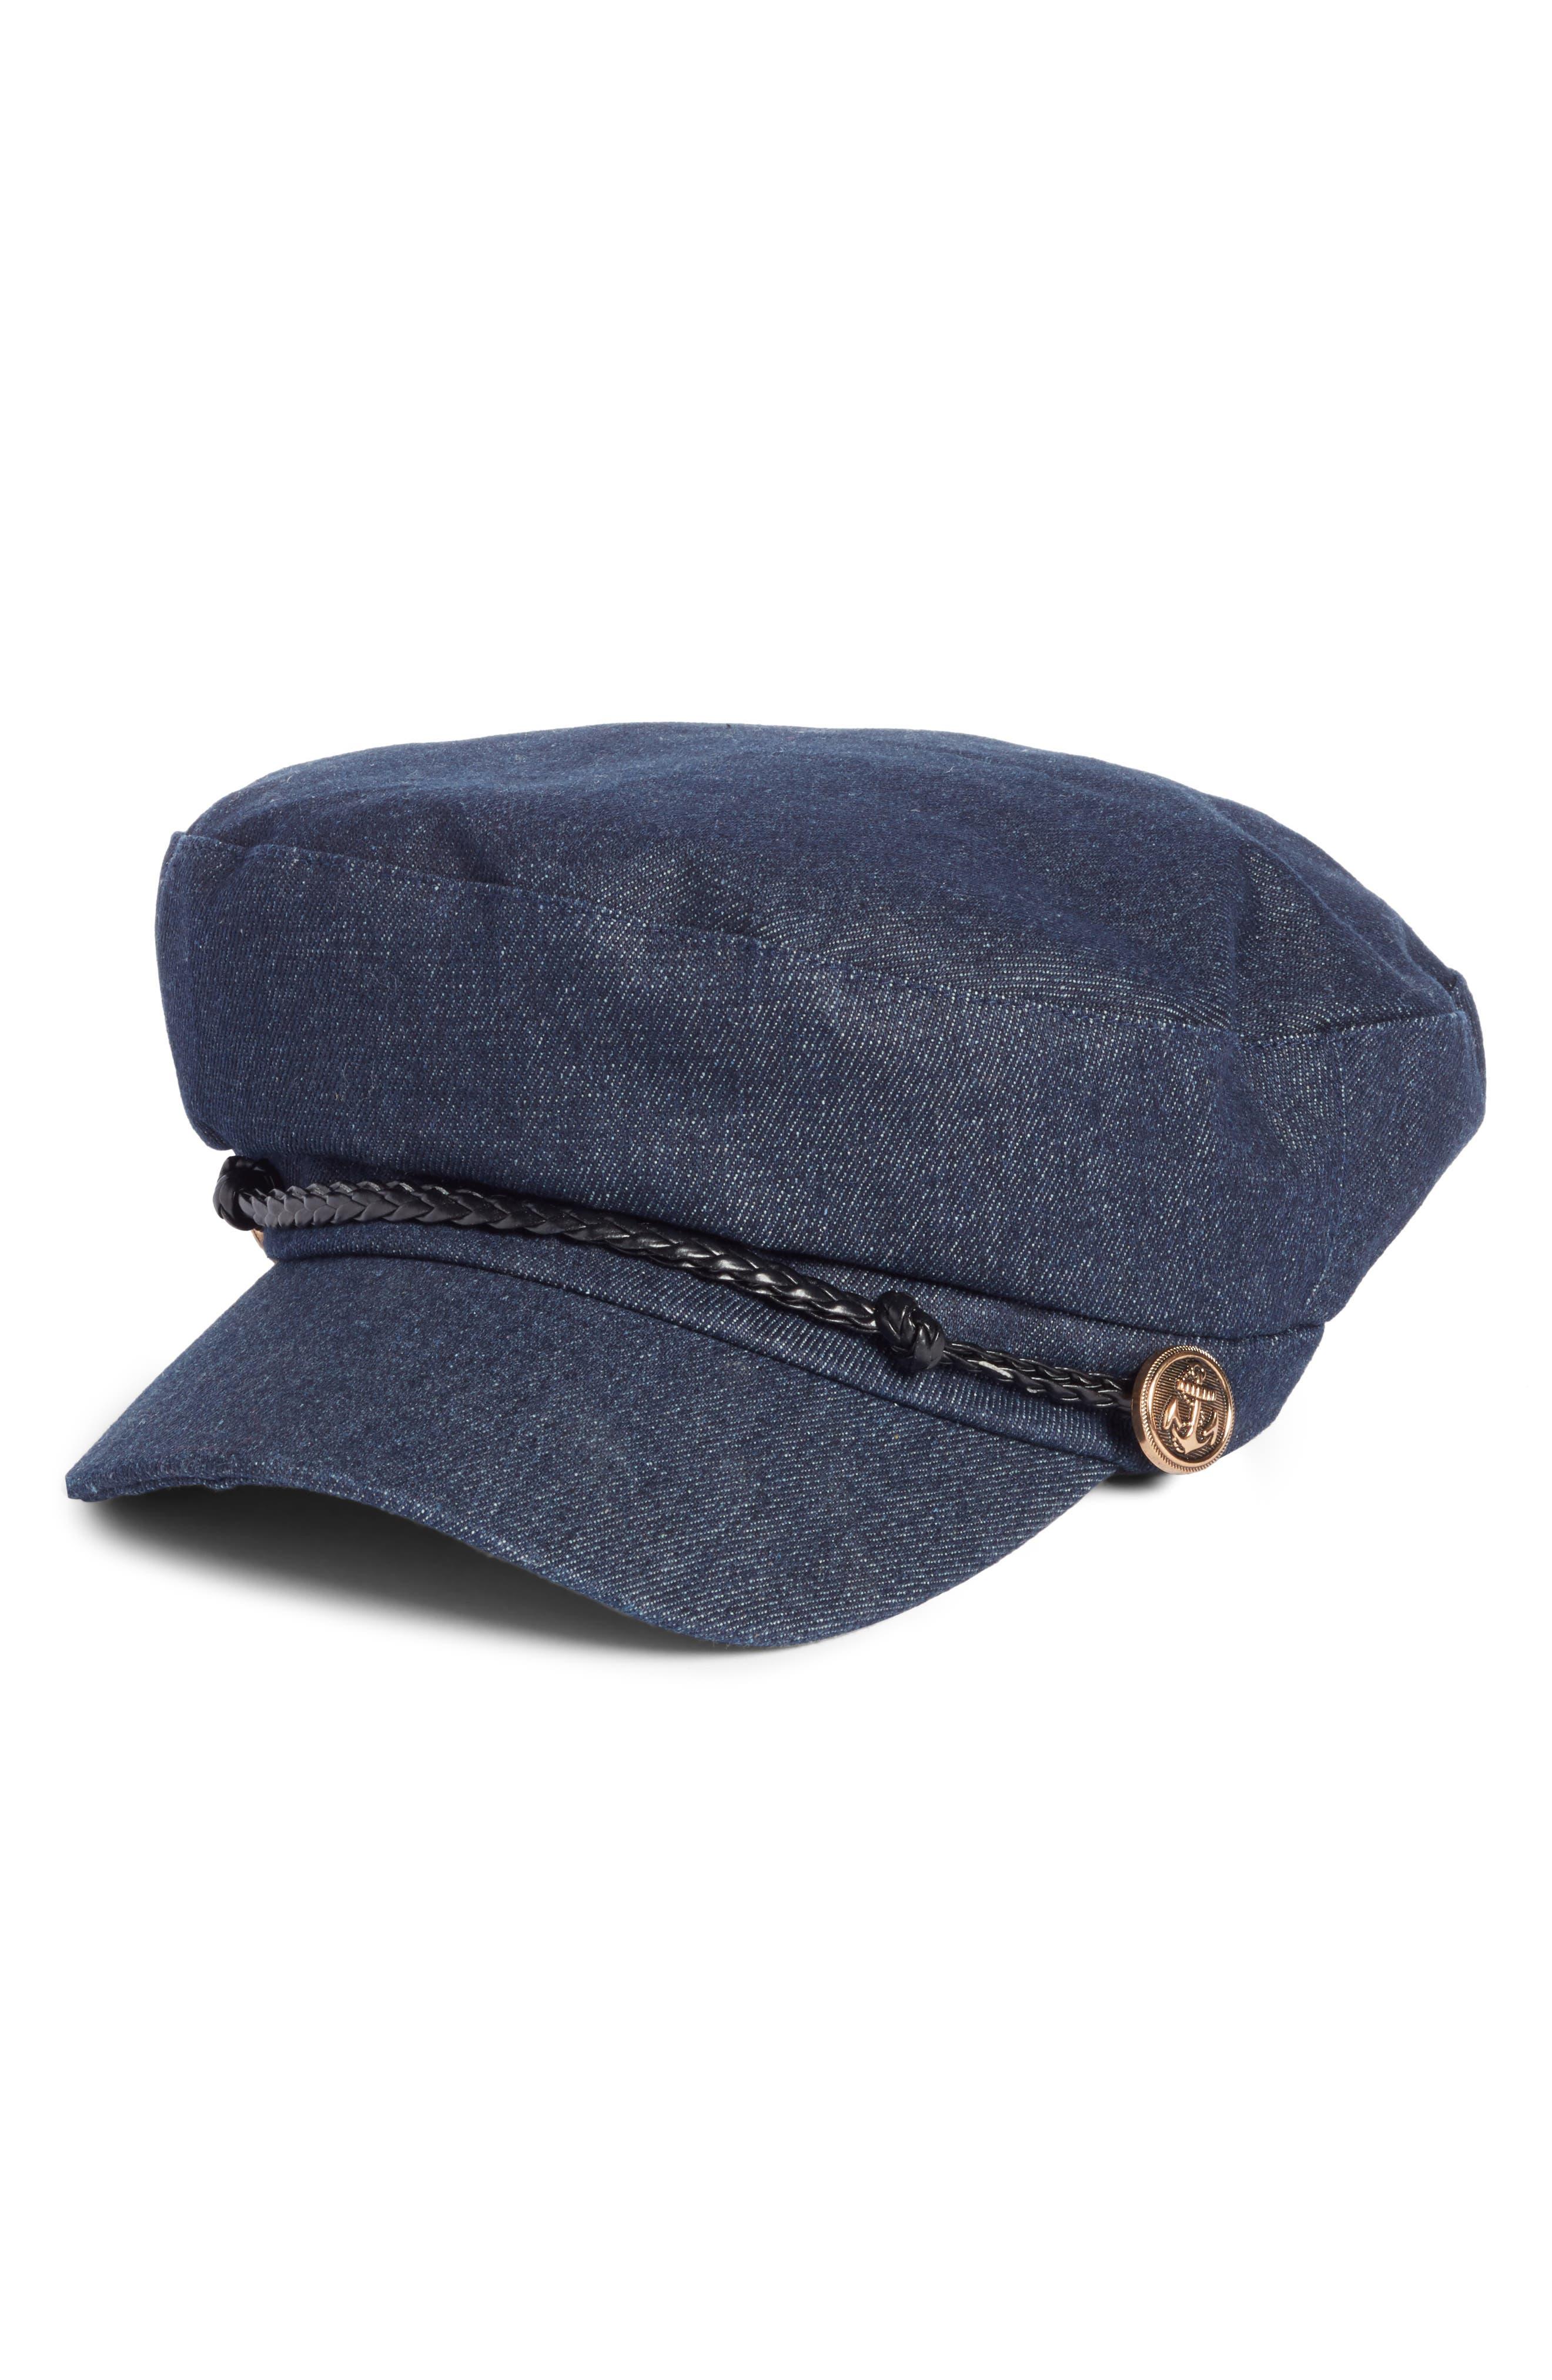 Denim Captain Hat,                         Main,                         color, Dark Blue